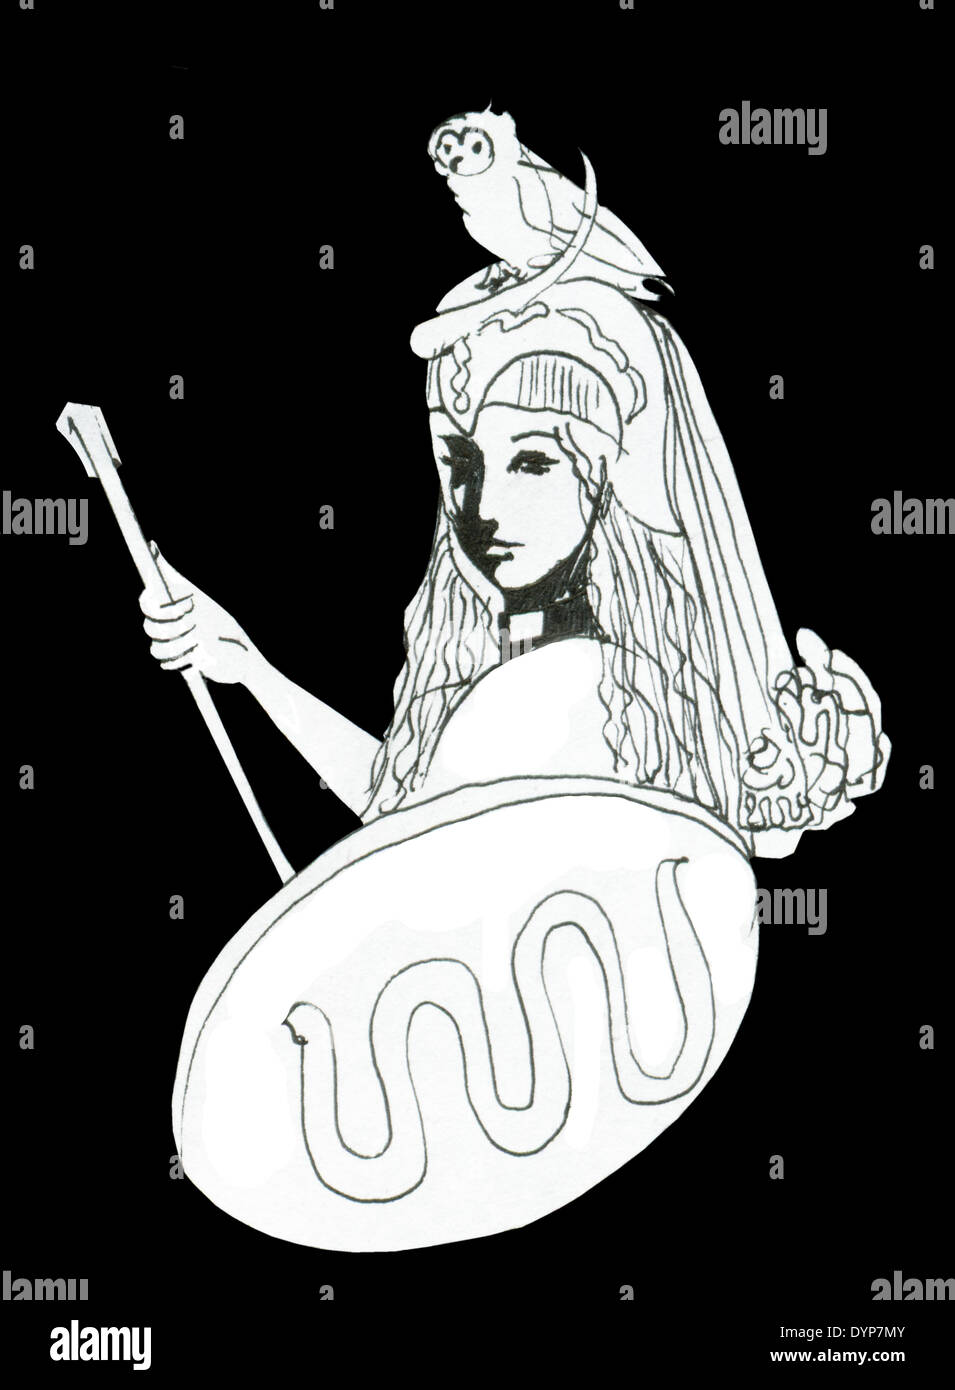 Athena Goddess Stock Photos Athena Goddess Stock Images Alamy